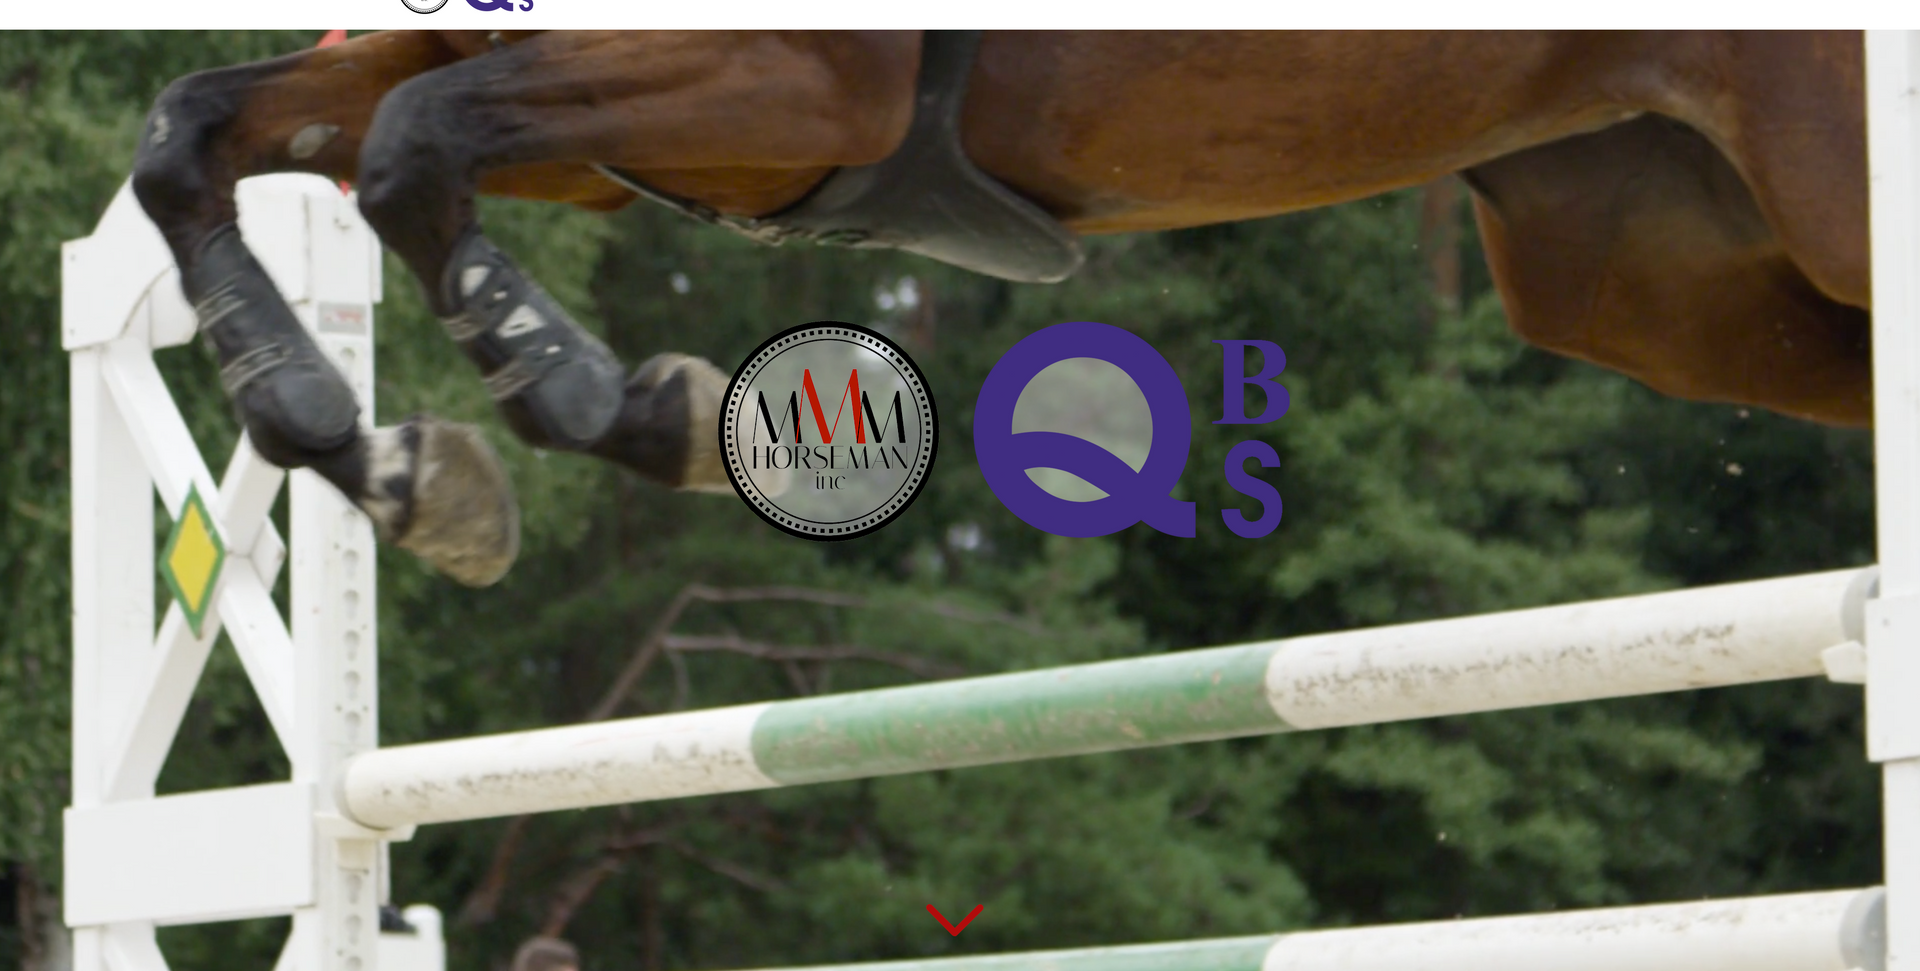 MMM Horseman Inc.